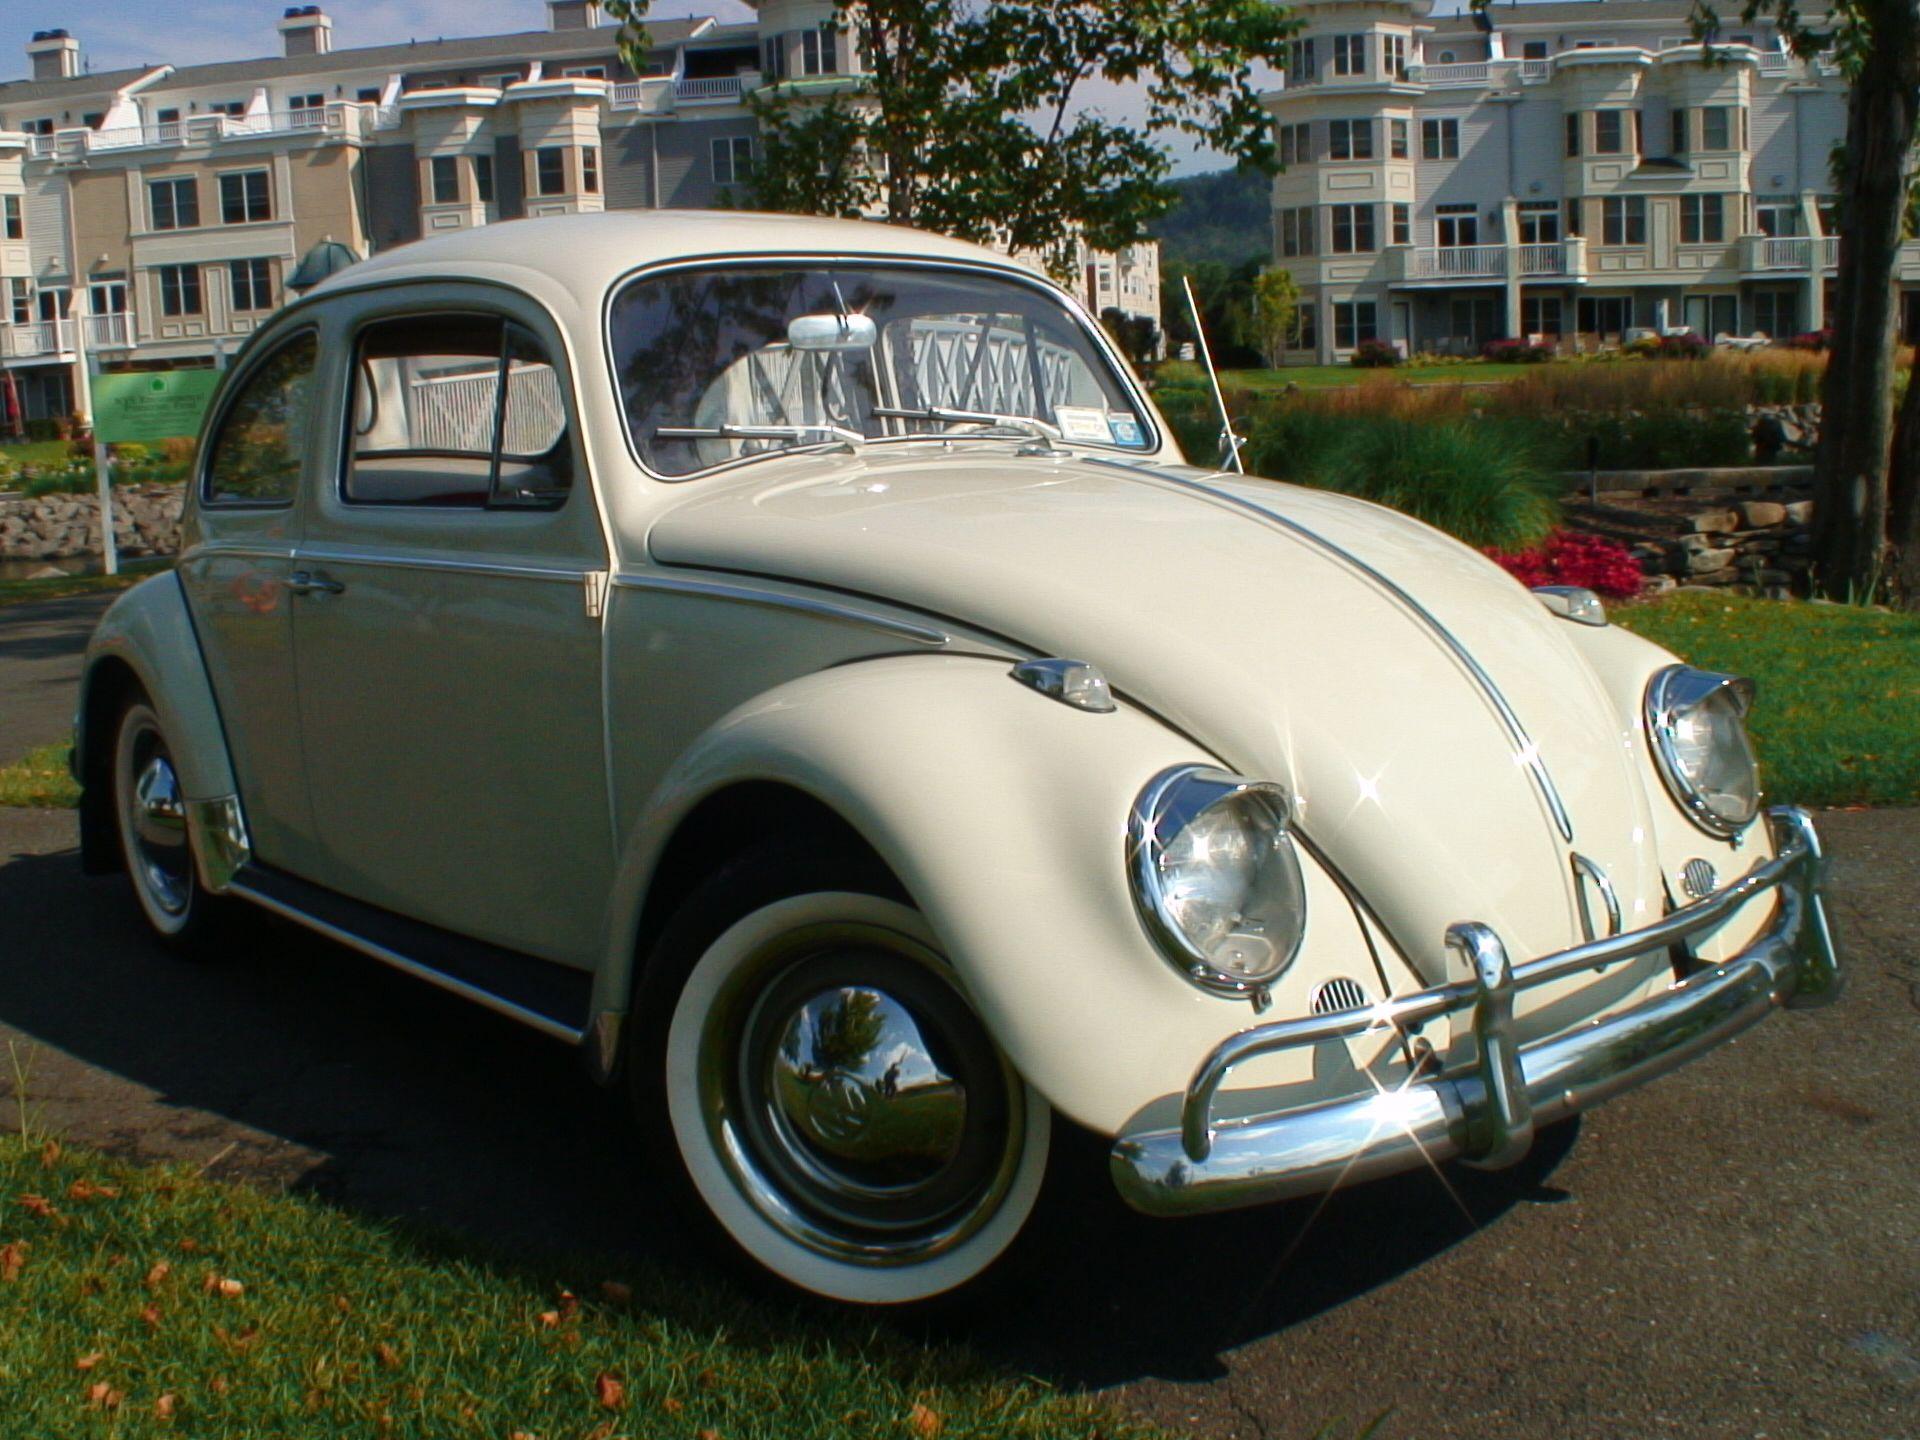 vw bugs classic 1963 vw beetle bug sedan classic vw beetles bugs volkswagen punch. Black Bedroom Furniture Sets. Home Design Ideas